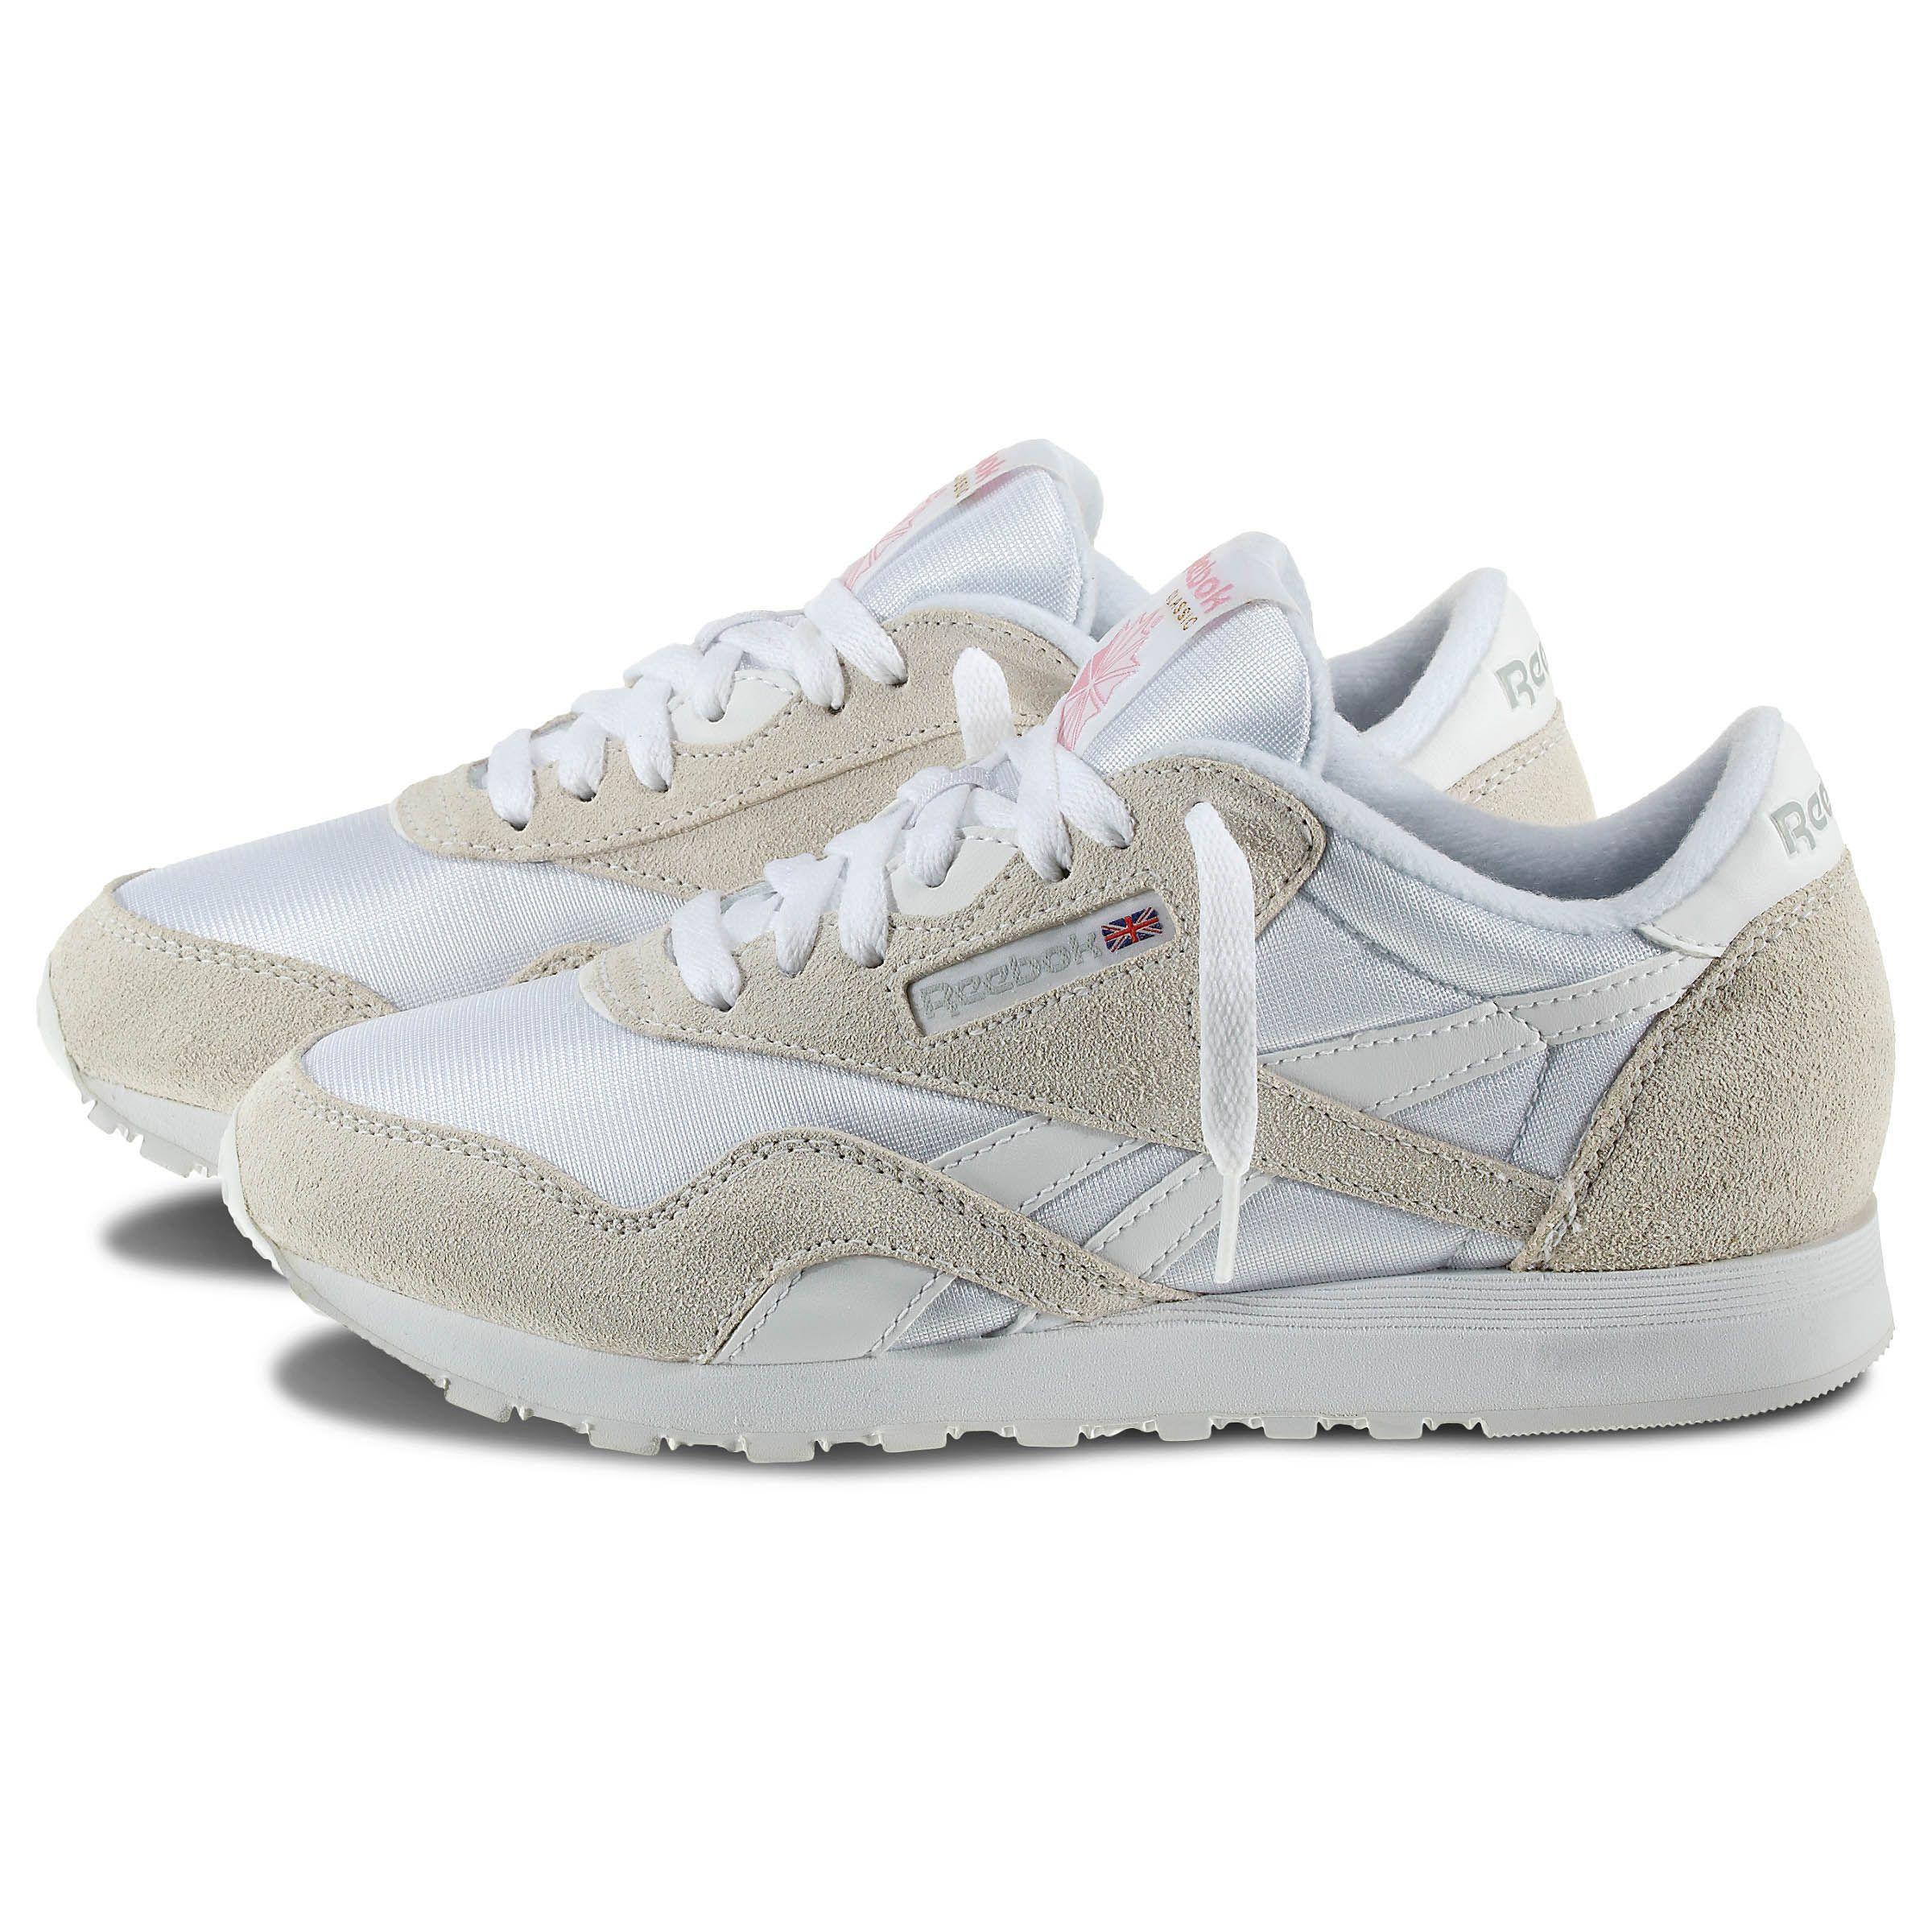 f957c53a55 Classic Nylon | Wish List | White reebok, Reebok, Shoes